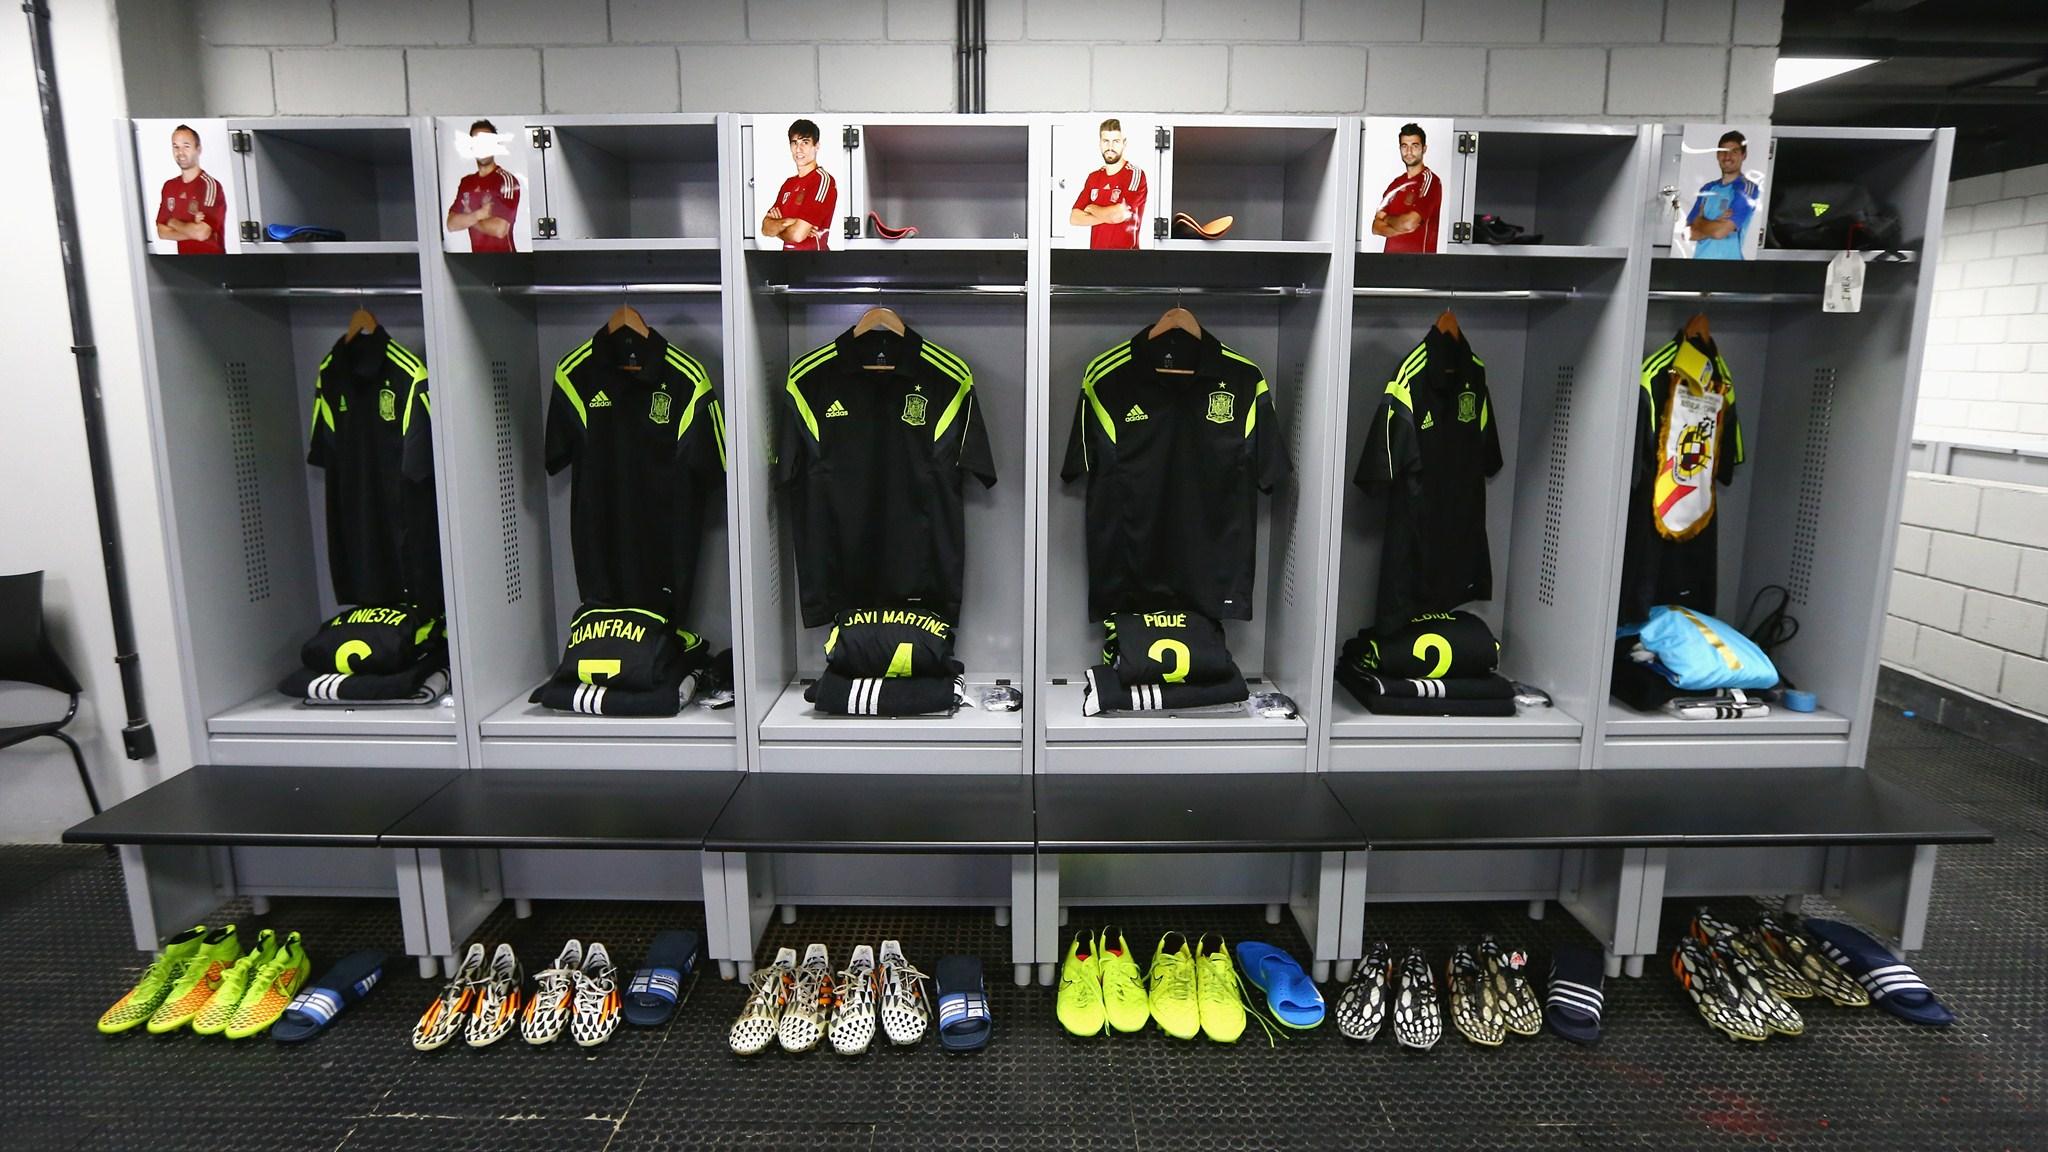 99 - Australia-Spain [0-3] -- 23 Jun 2014 - 13-00 - kuaza